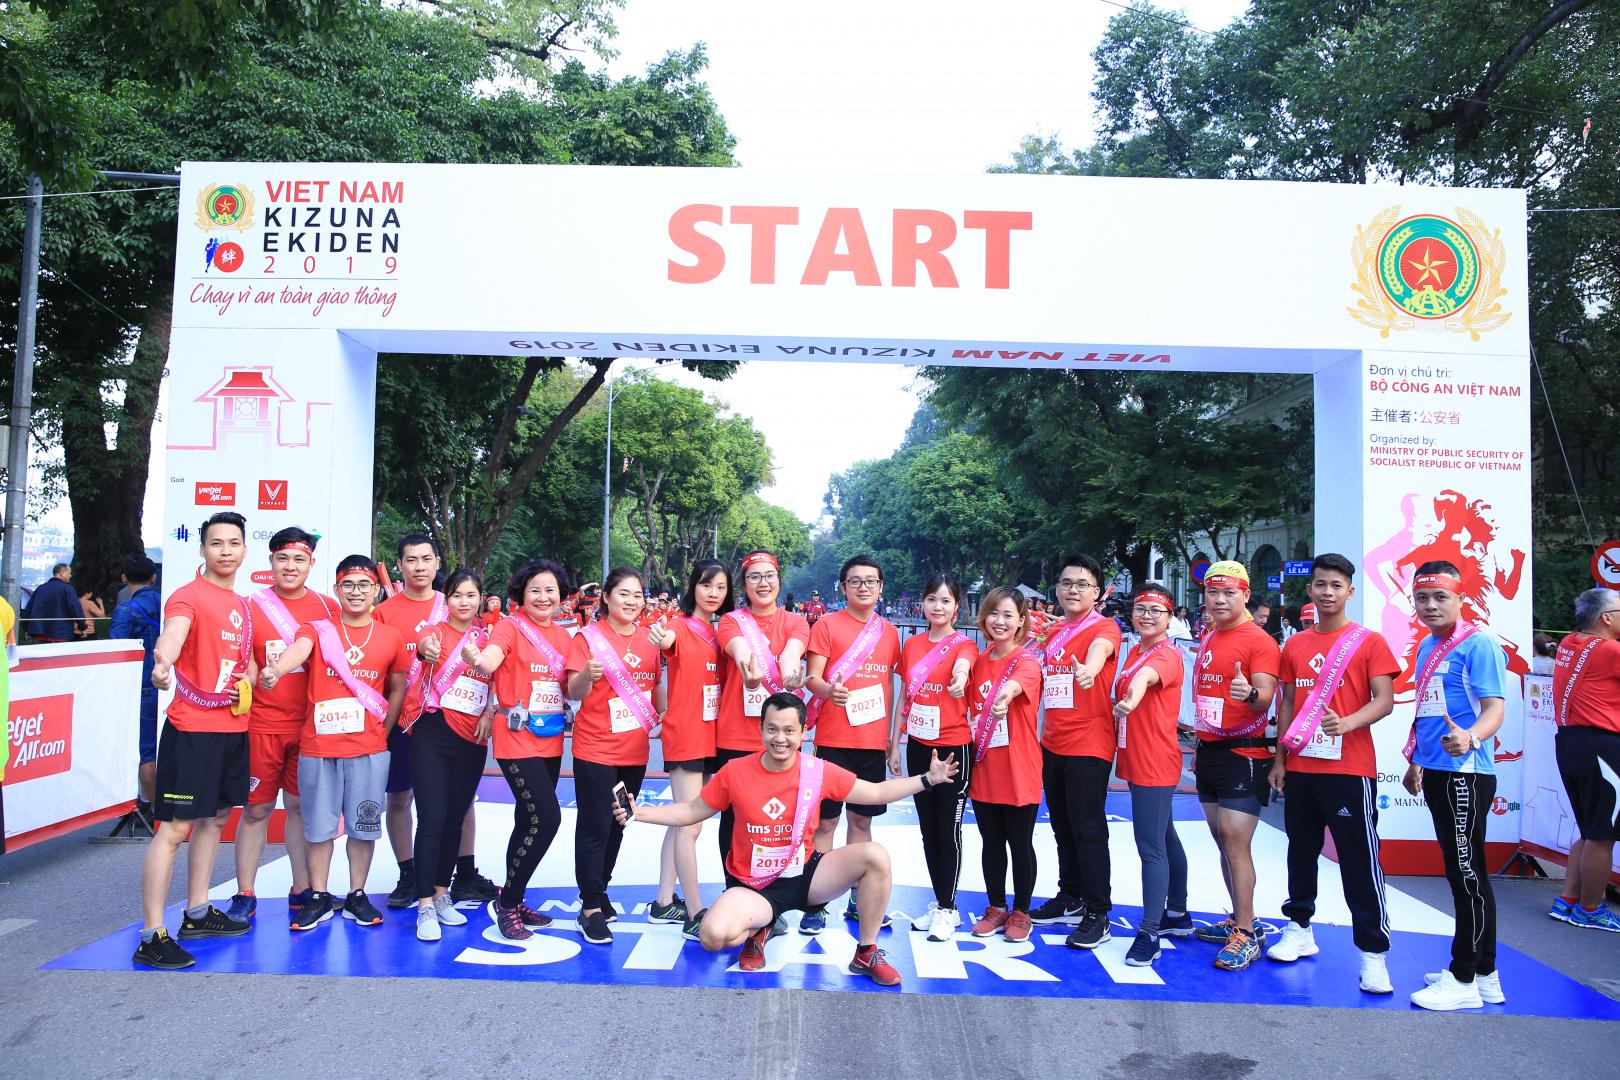 100 VĐV TMS Group tham gia giải chạy Kizuna Ekiden 2019